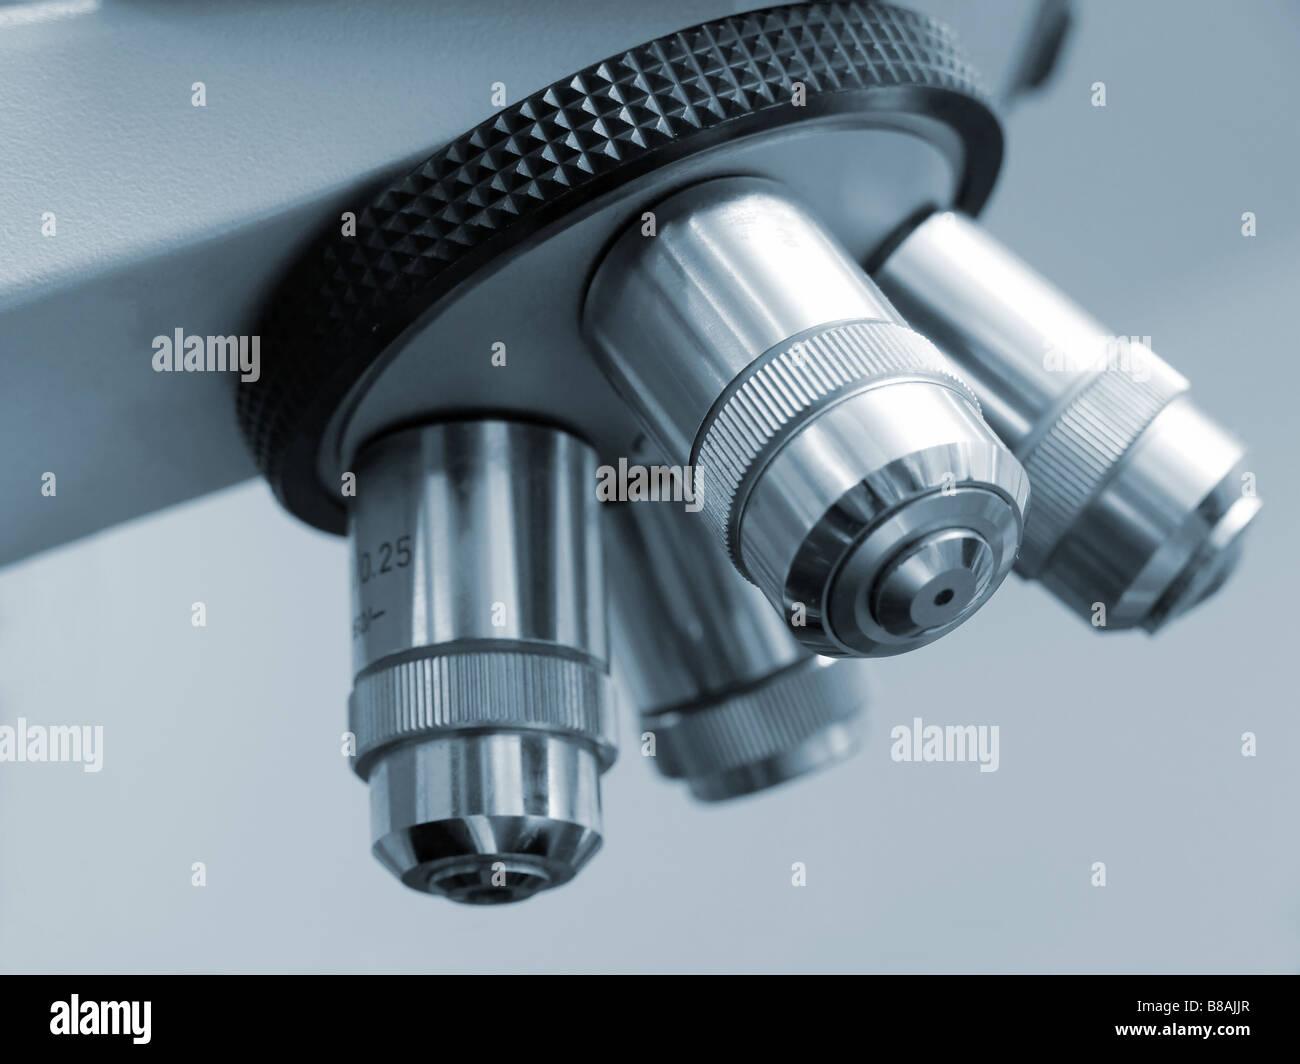 Closeup shot of electronic microscope revolving nosepiece - Stock Image